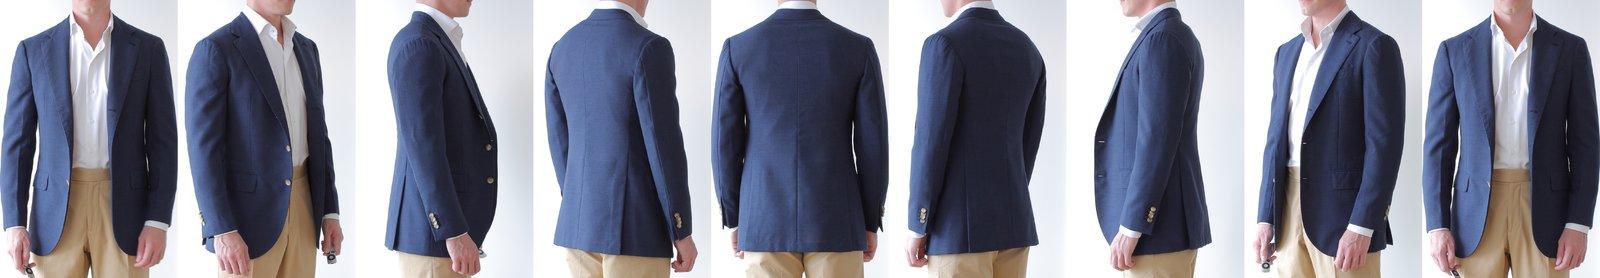 jacketBlueOpen.jpg